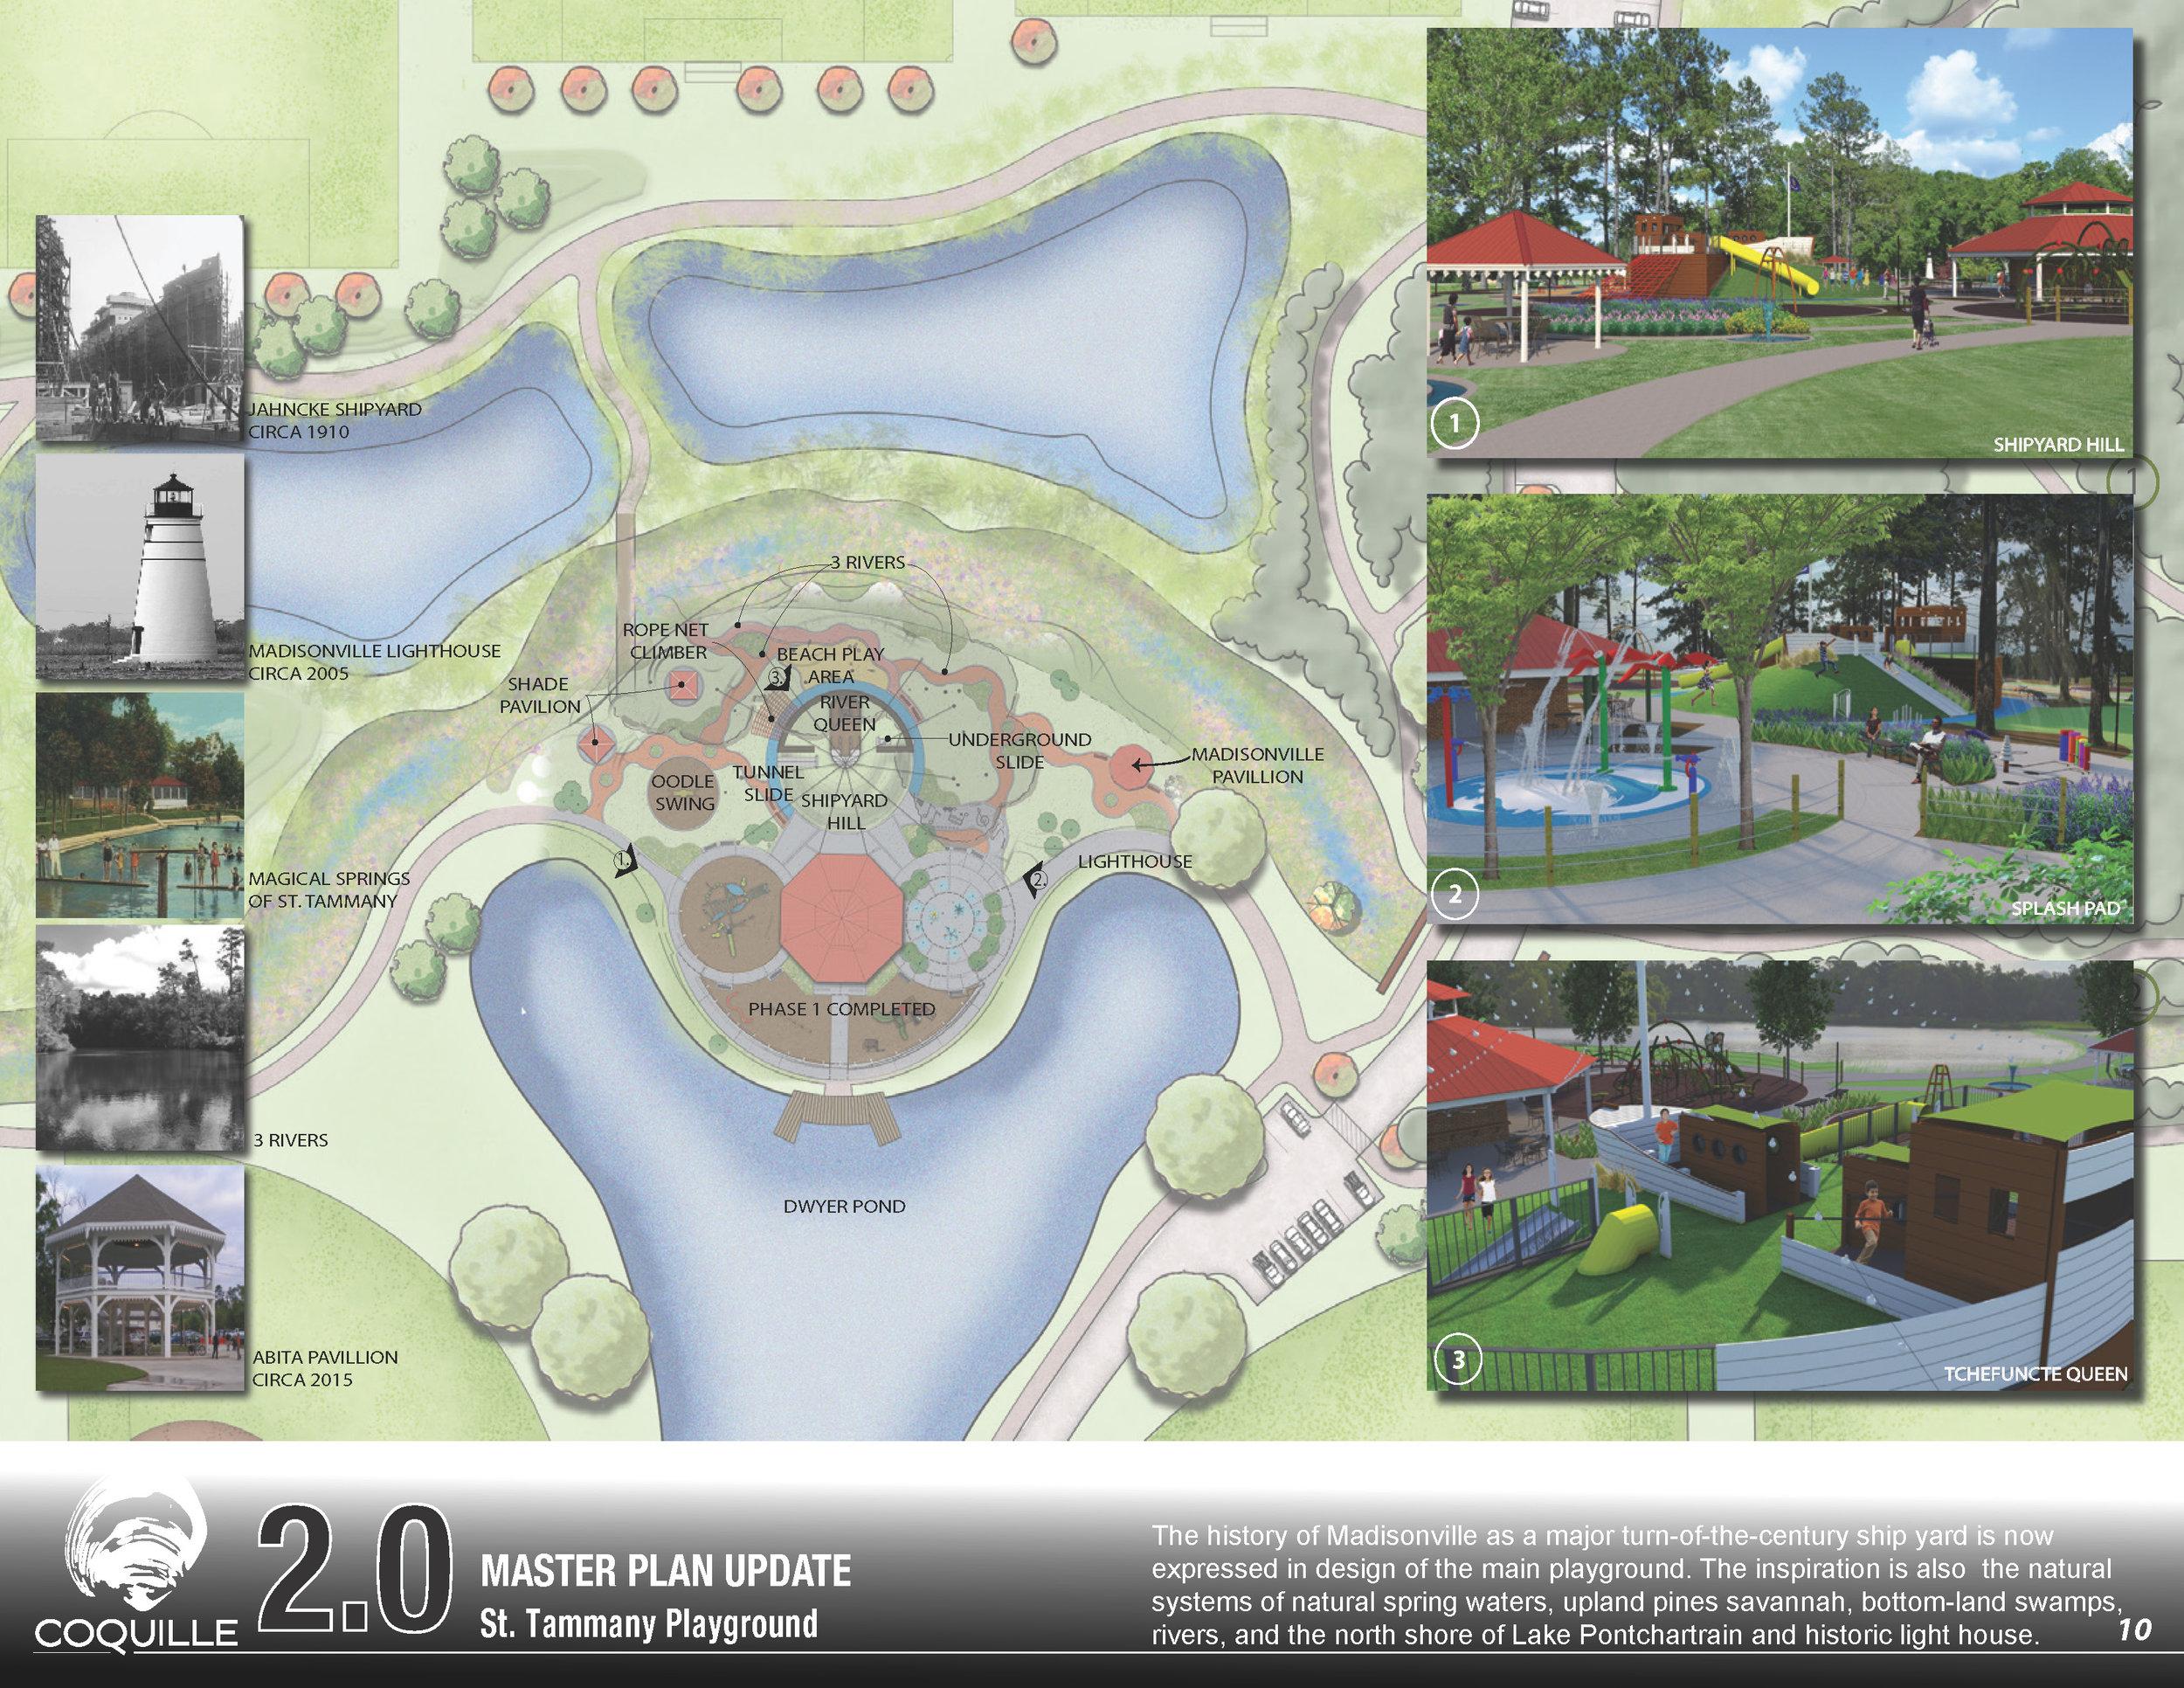 Joseph Furr Design Studio - Coquille Master Plan_Page_08.jpg